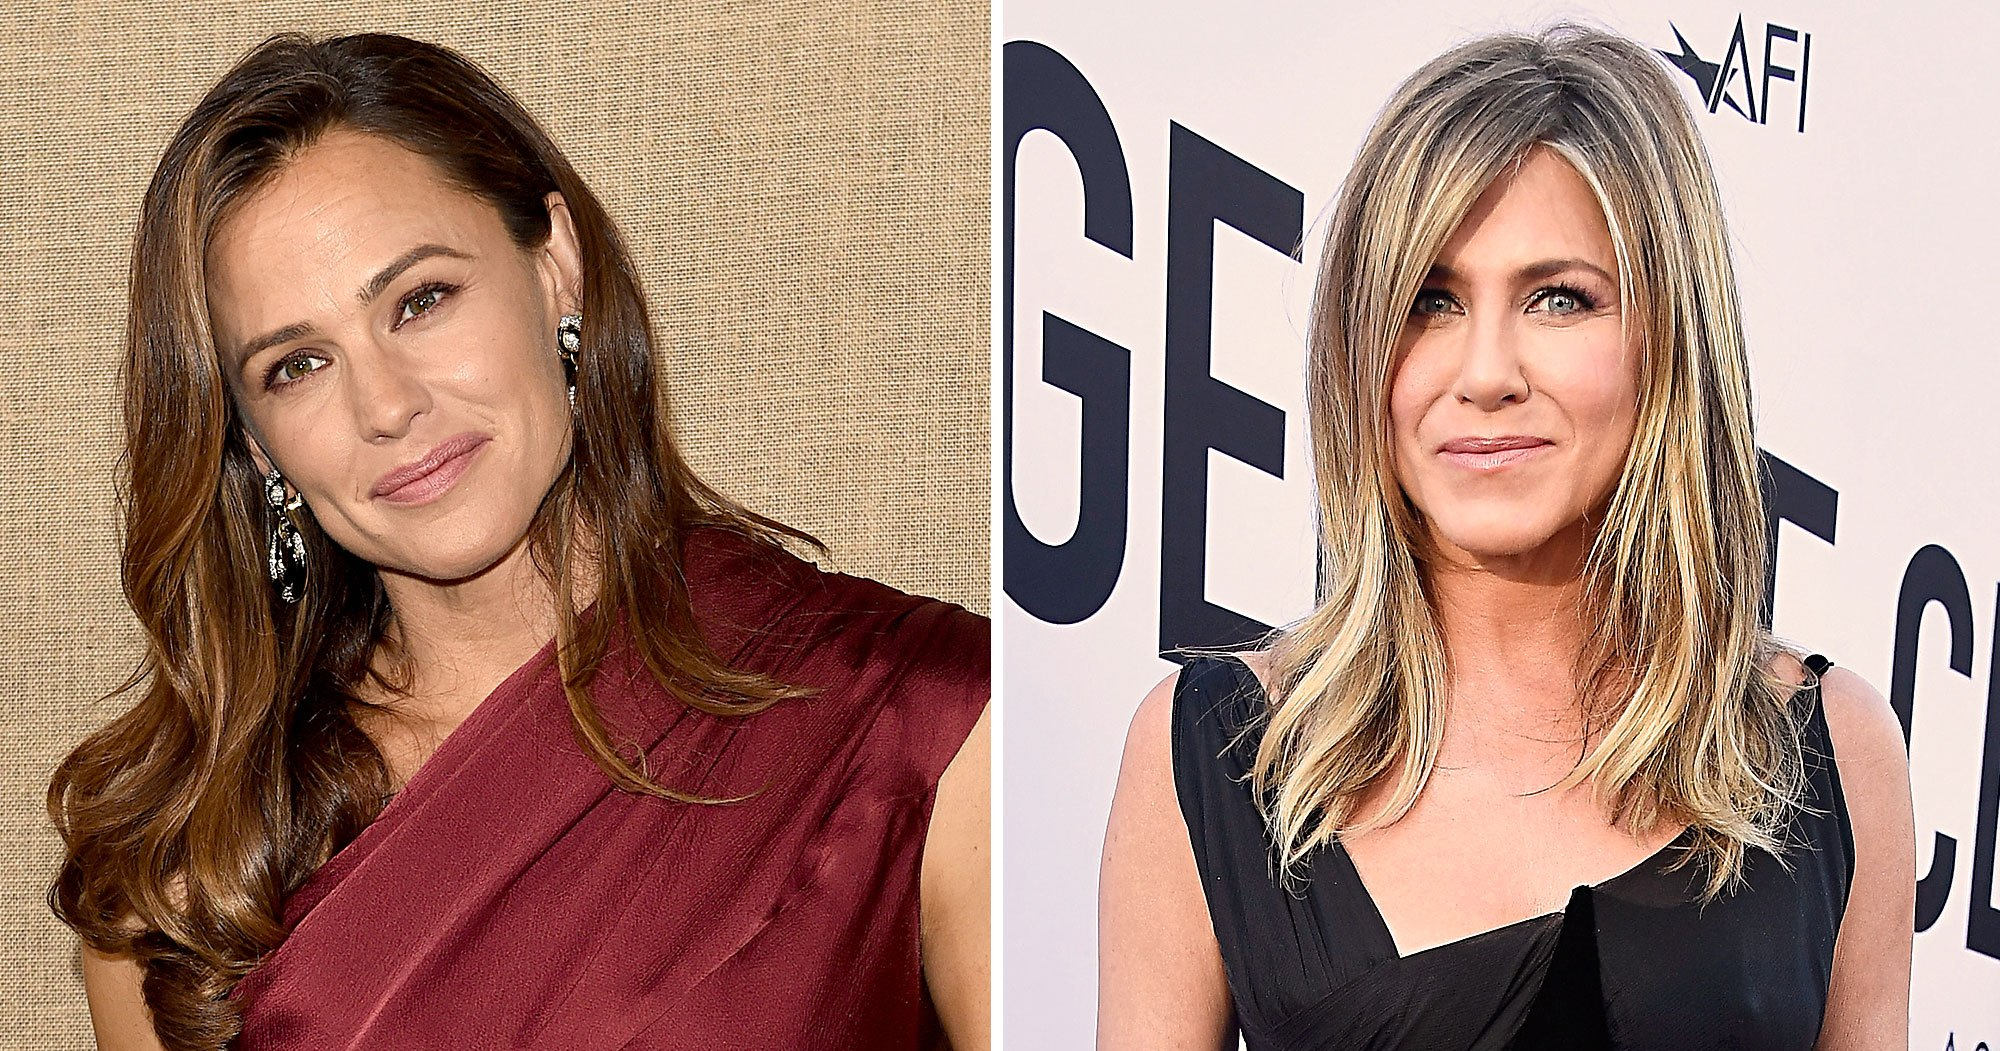 Why Jennifer Aniston, Jennifer Garner, Olivia Culpo and More Celebs Are Drinking Collagen Supplements